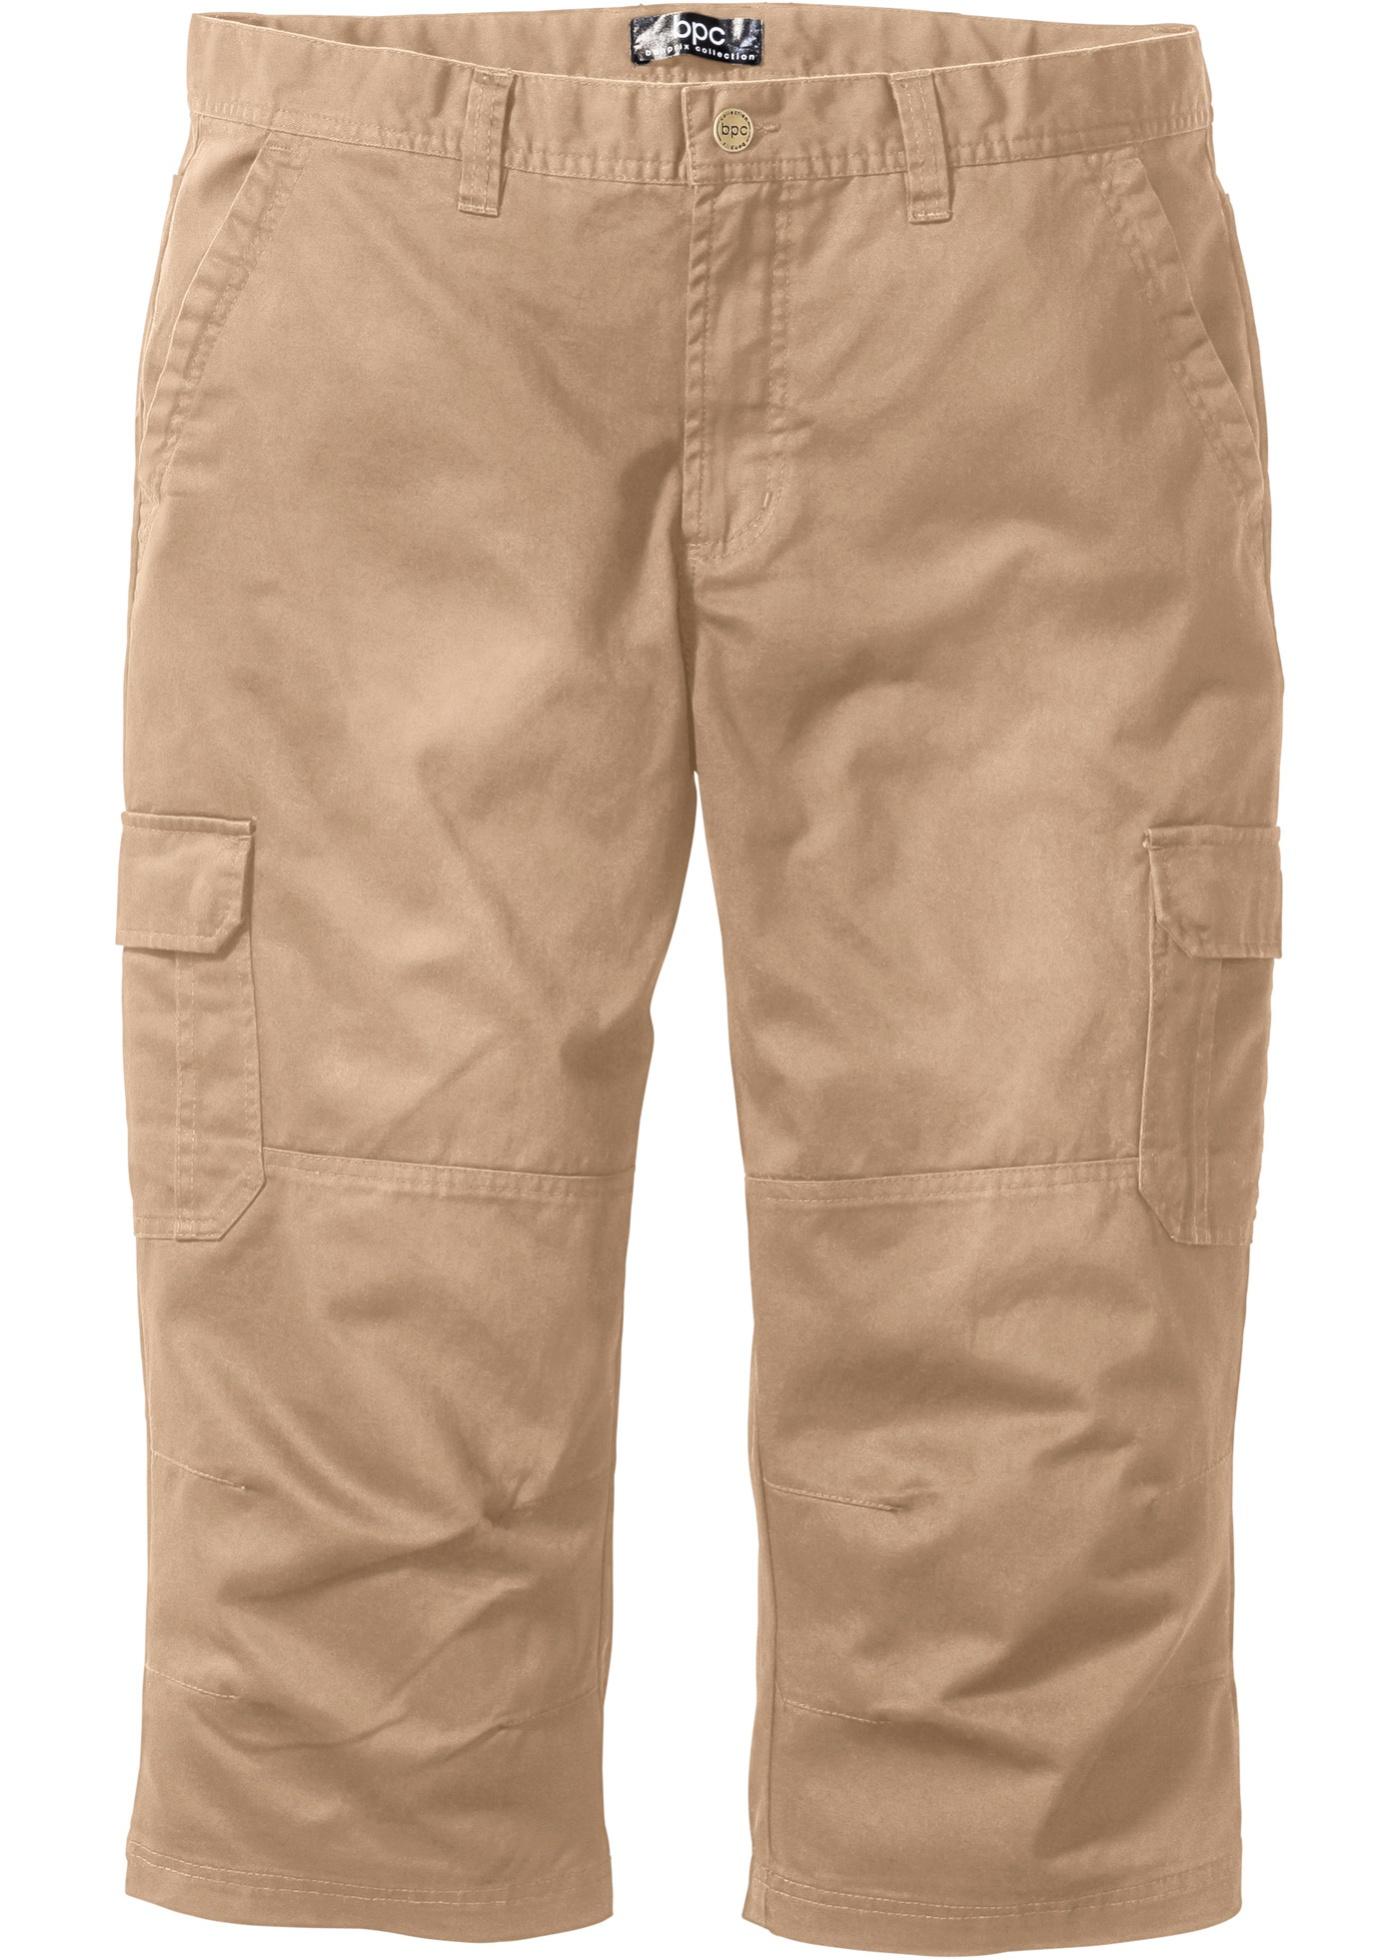 Pantalone cargo 3 4  Beig